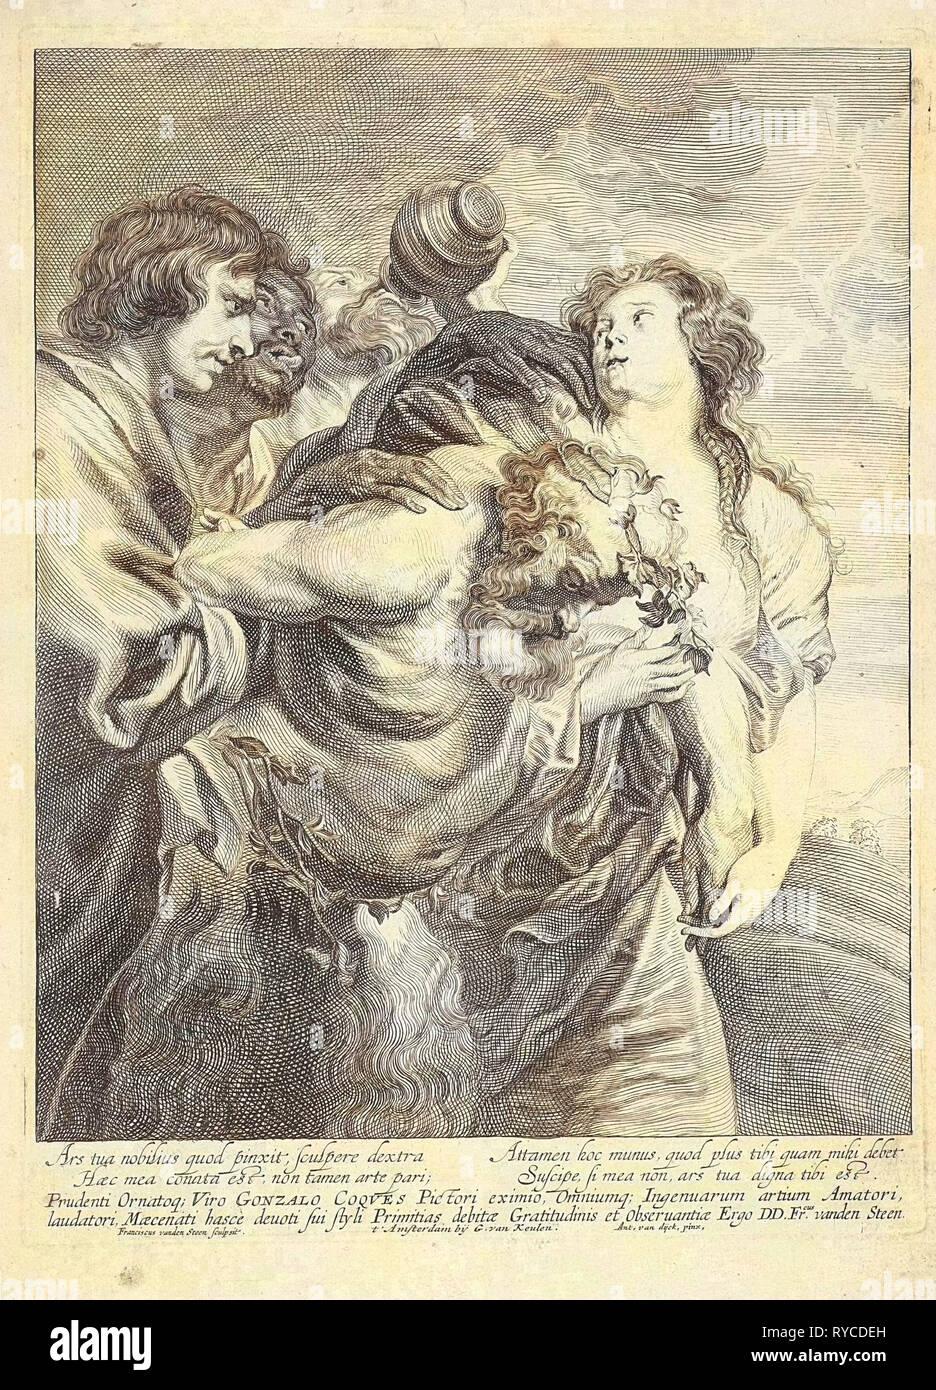 Drunken Silenus supported by Bacchantes, Franciscus van der Steen, Gerard van Keulen, 1643 - 1672 Stock Photo